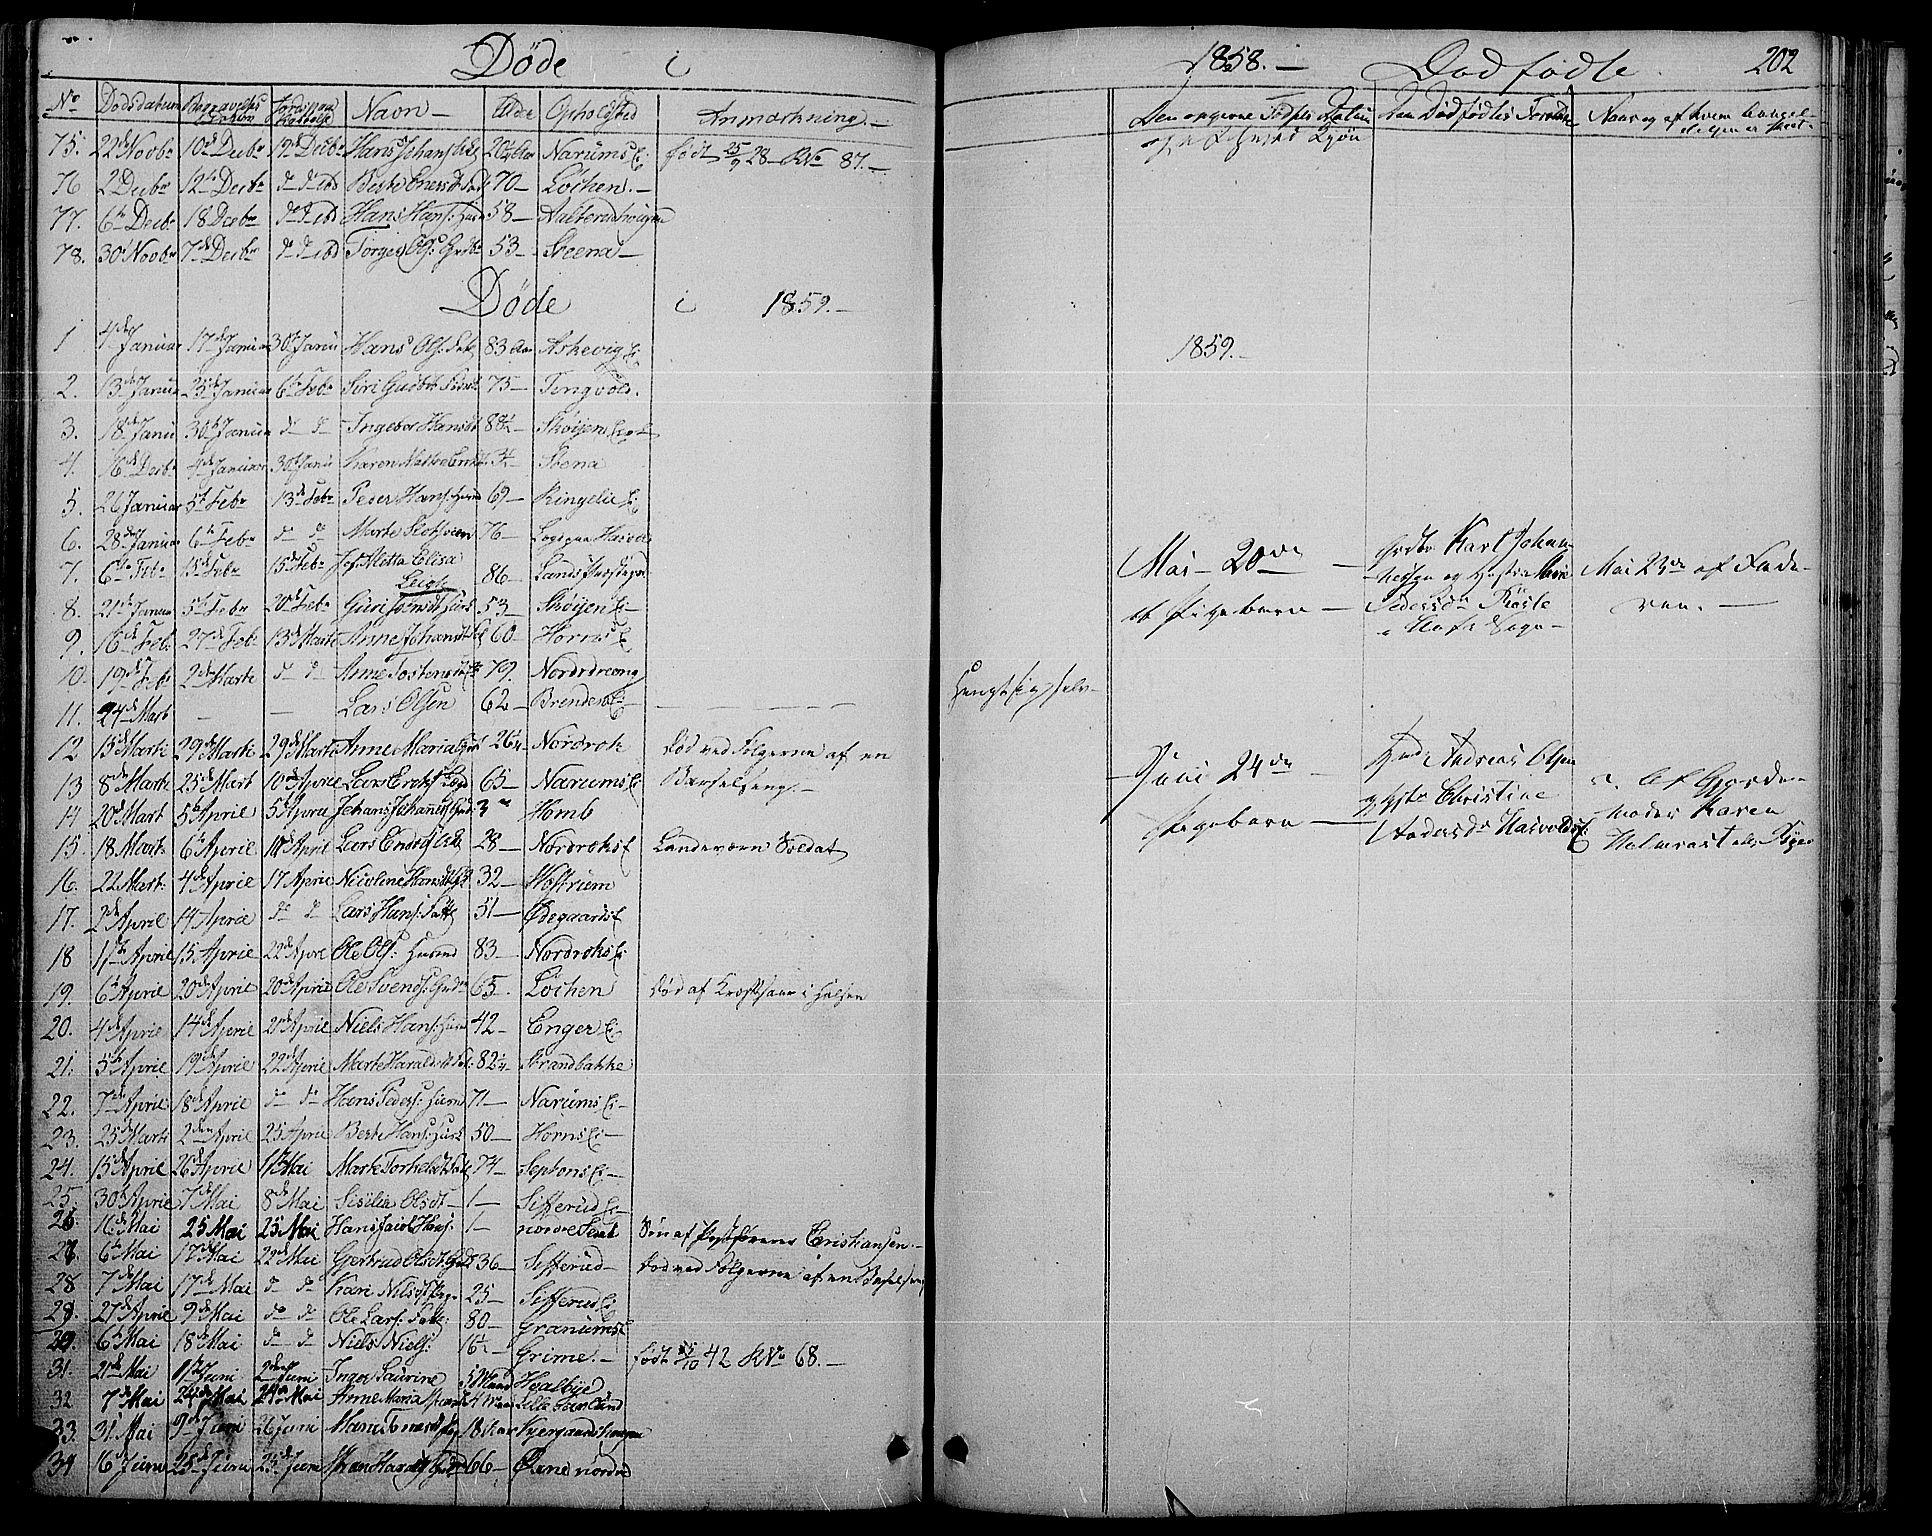 SAH, Søndre Land prestekontor, L/L0001: Klokkerbok nr. 1, 1849-1883, s. 202